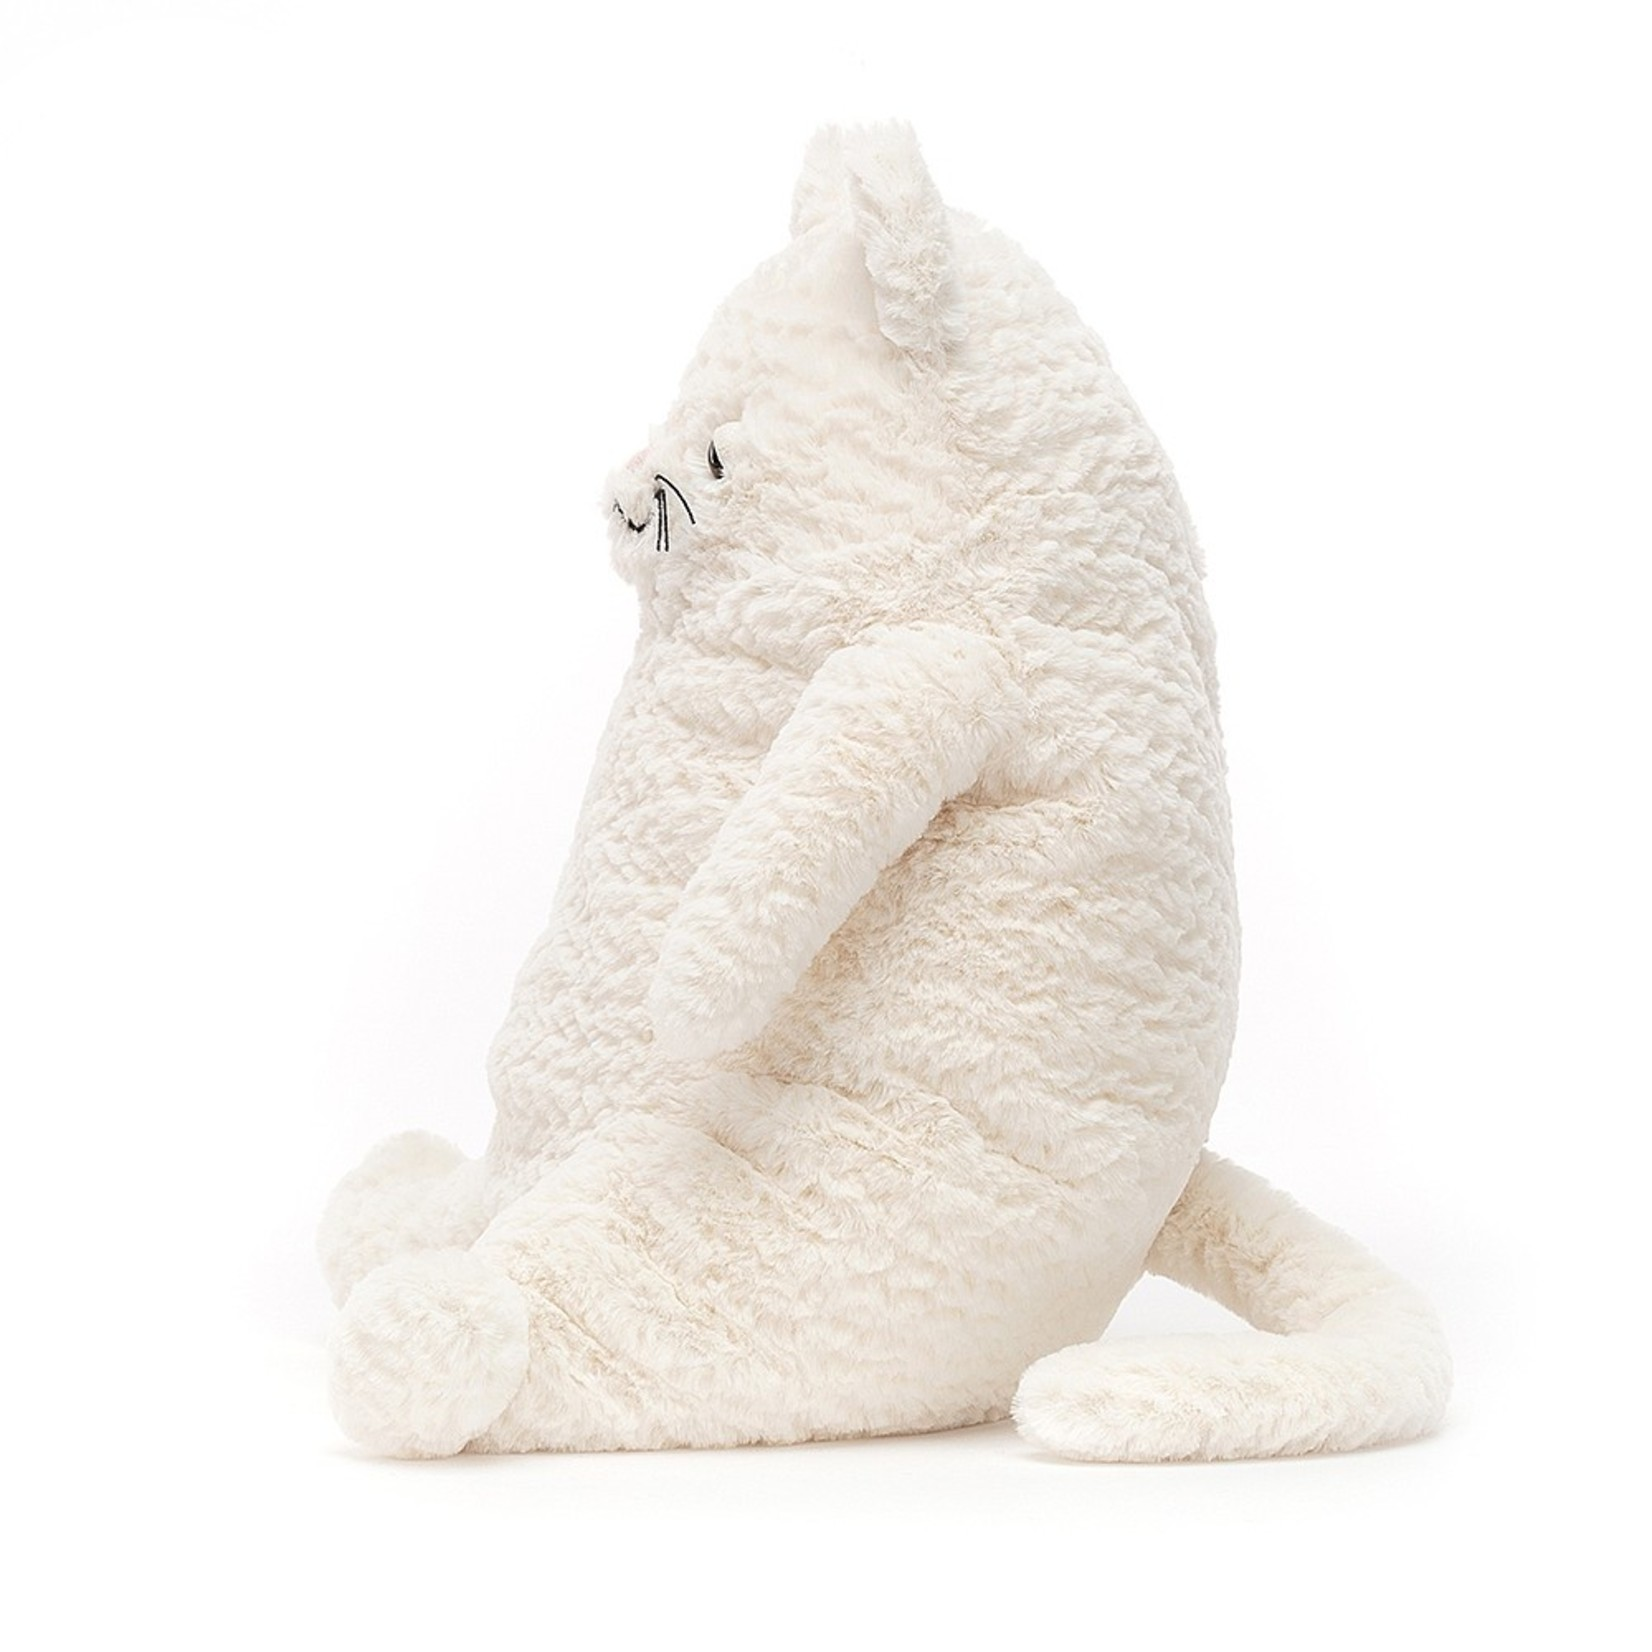 Jellycat Amore Cat in Cream